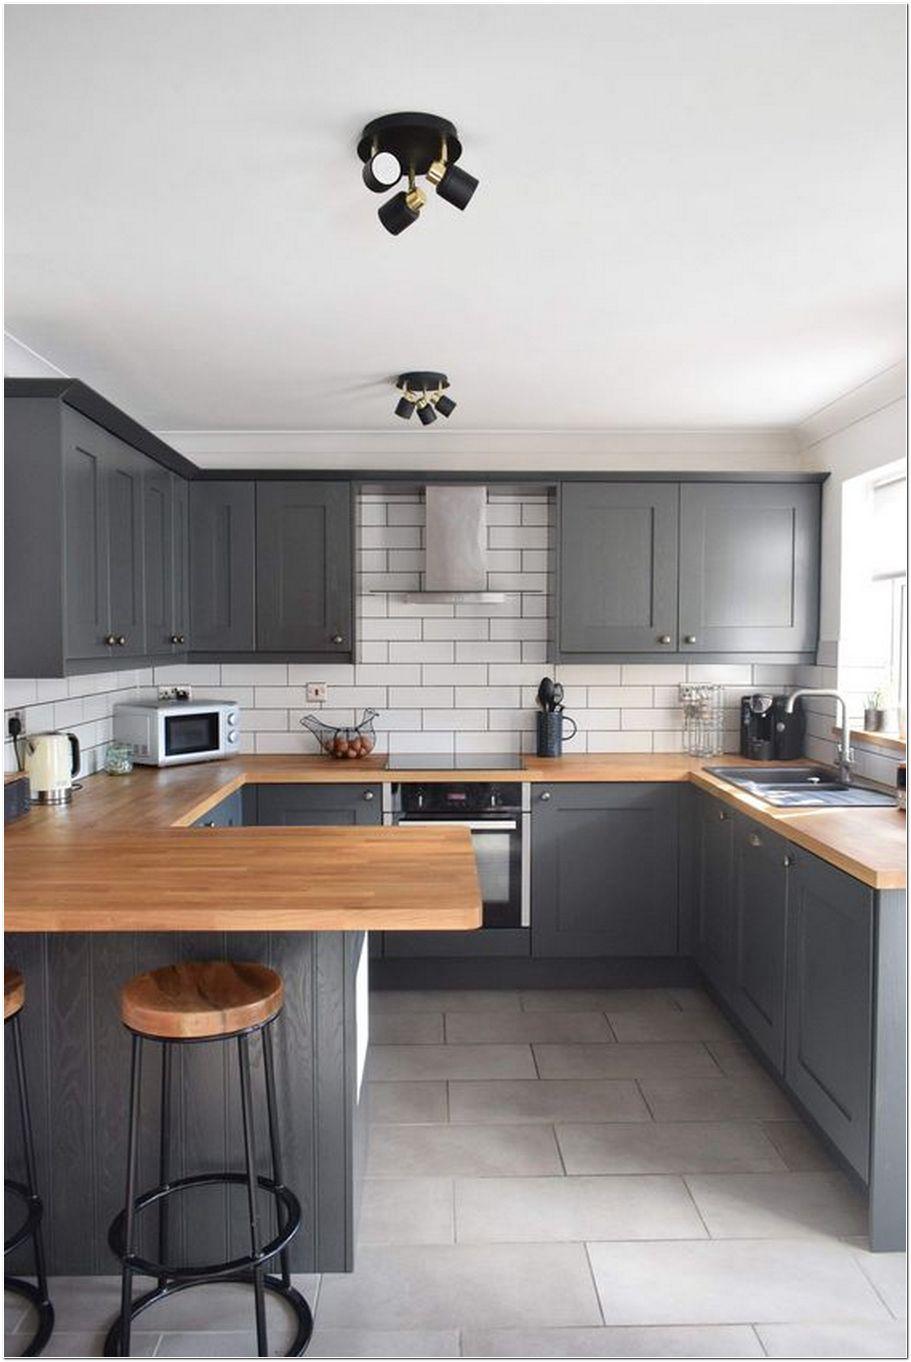 93 Budget Kitchen Renovation Ideas On A Budget 10 Budget Kitchen Remodel Kitchen Design Small Kitchen Layout